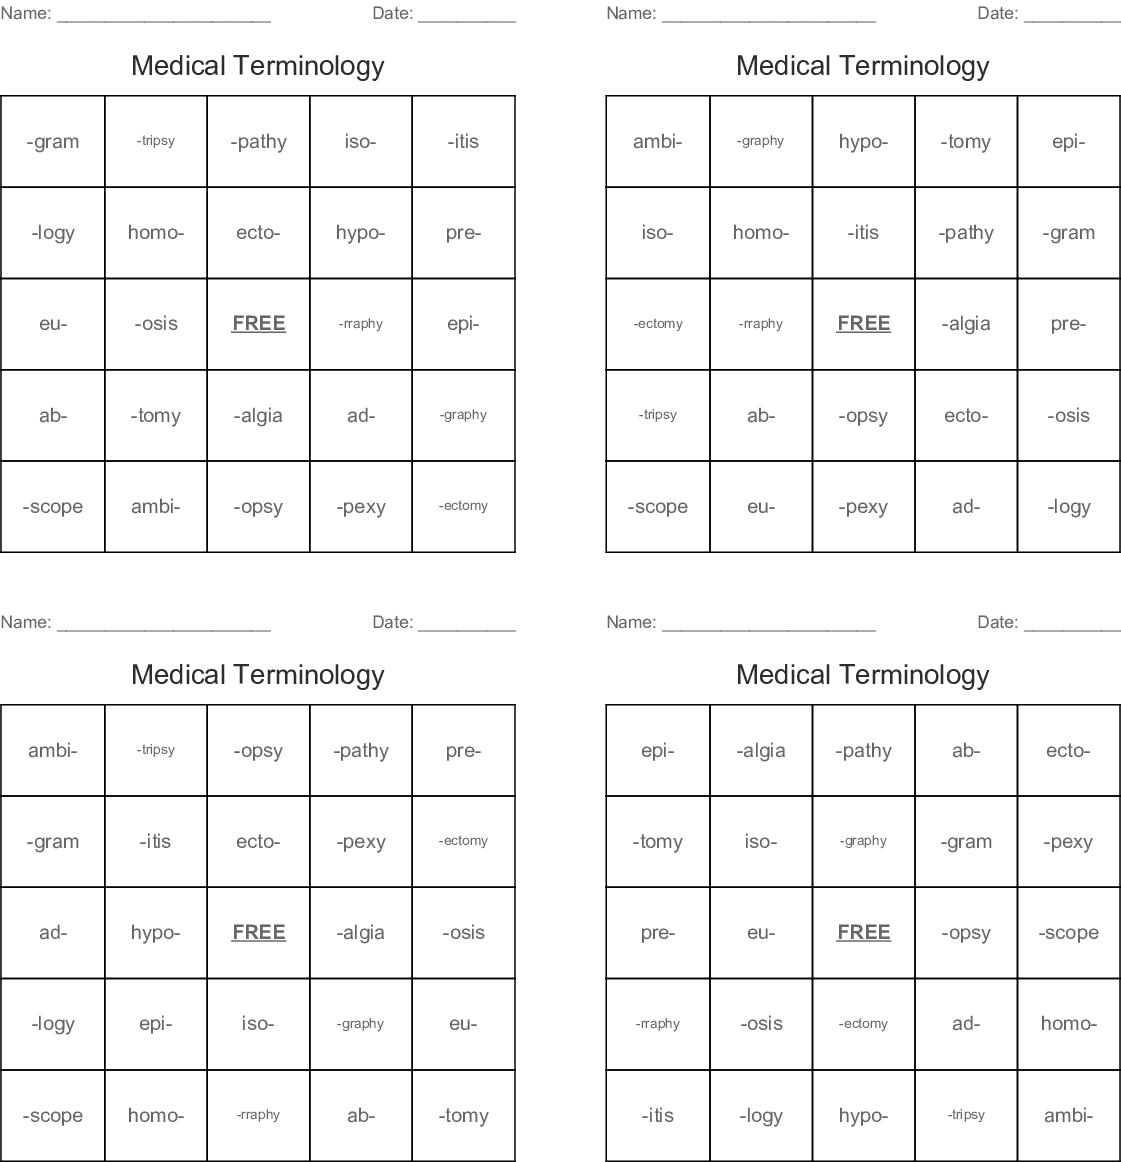 Medical Terminology Bingo Cards - WordMint